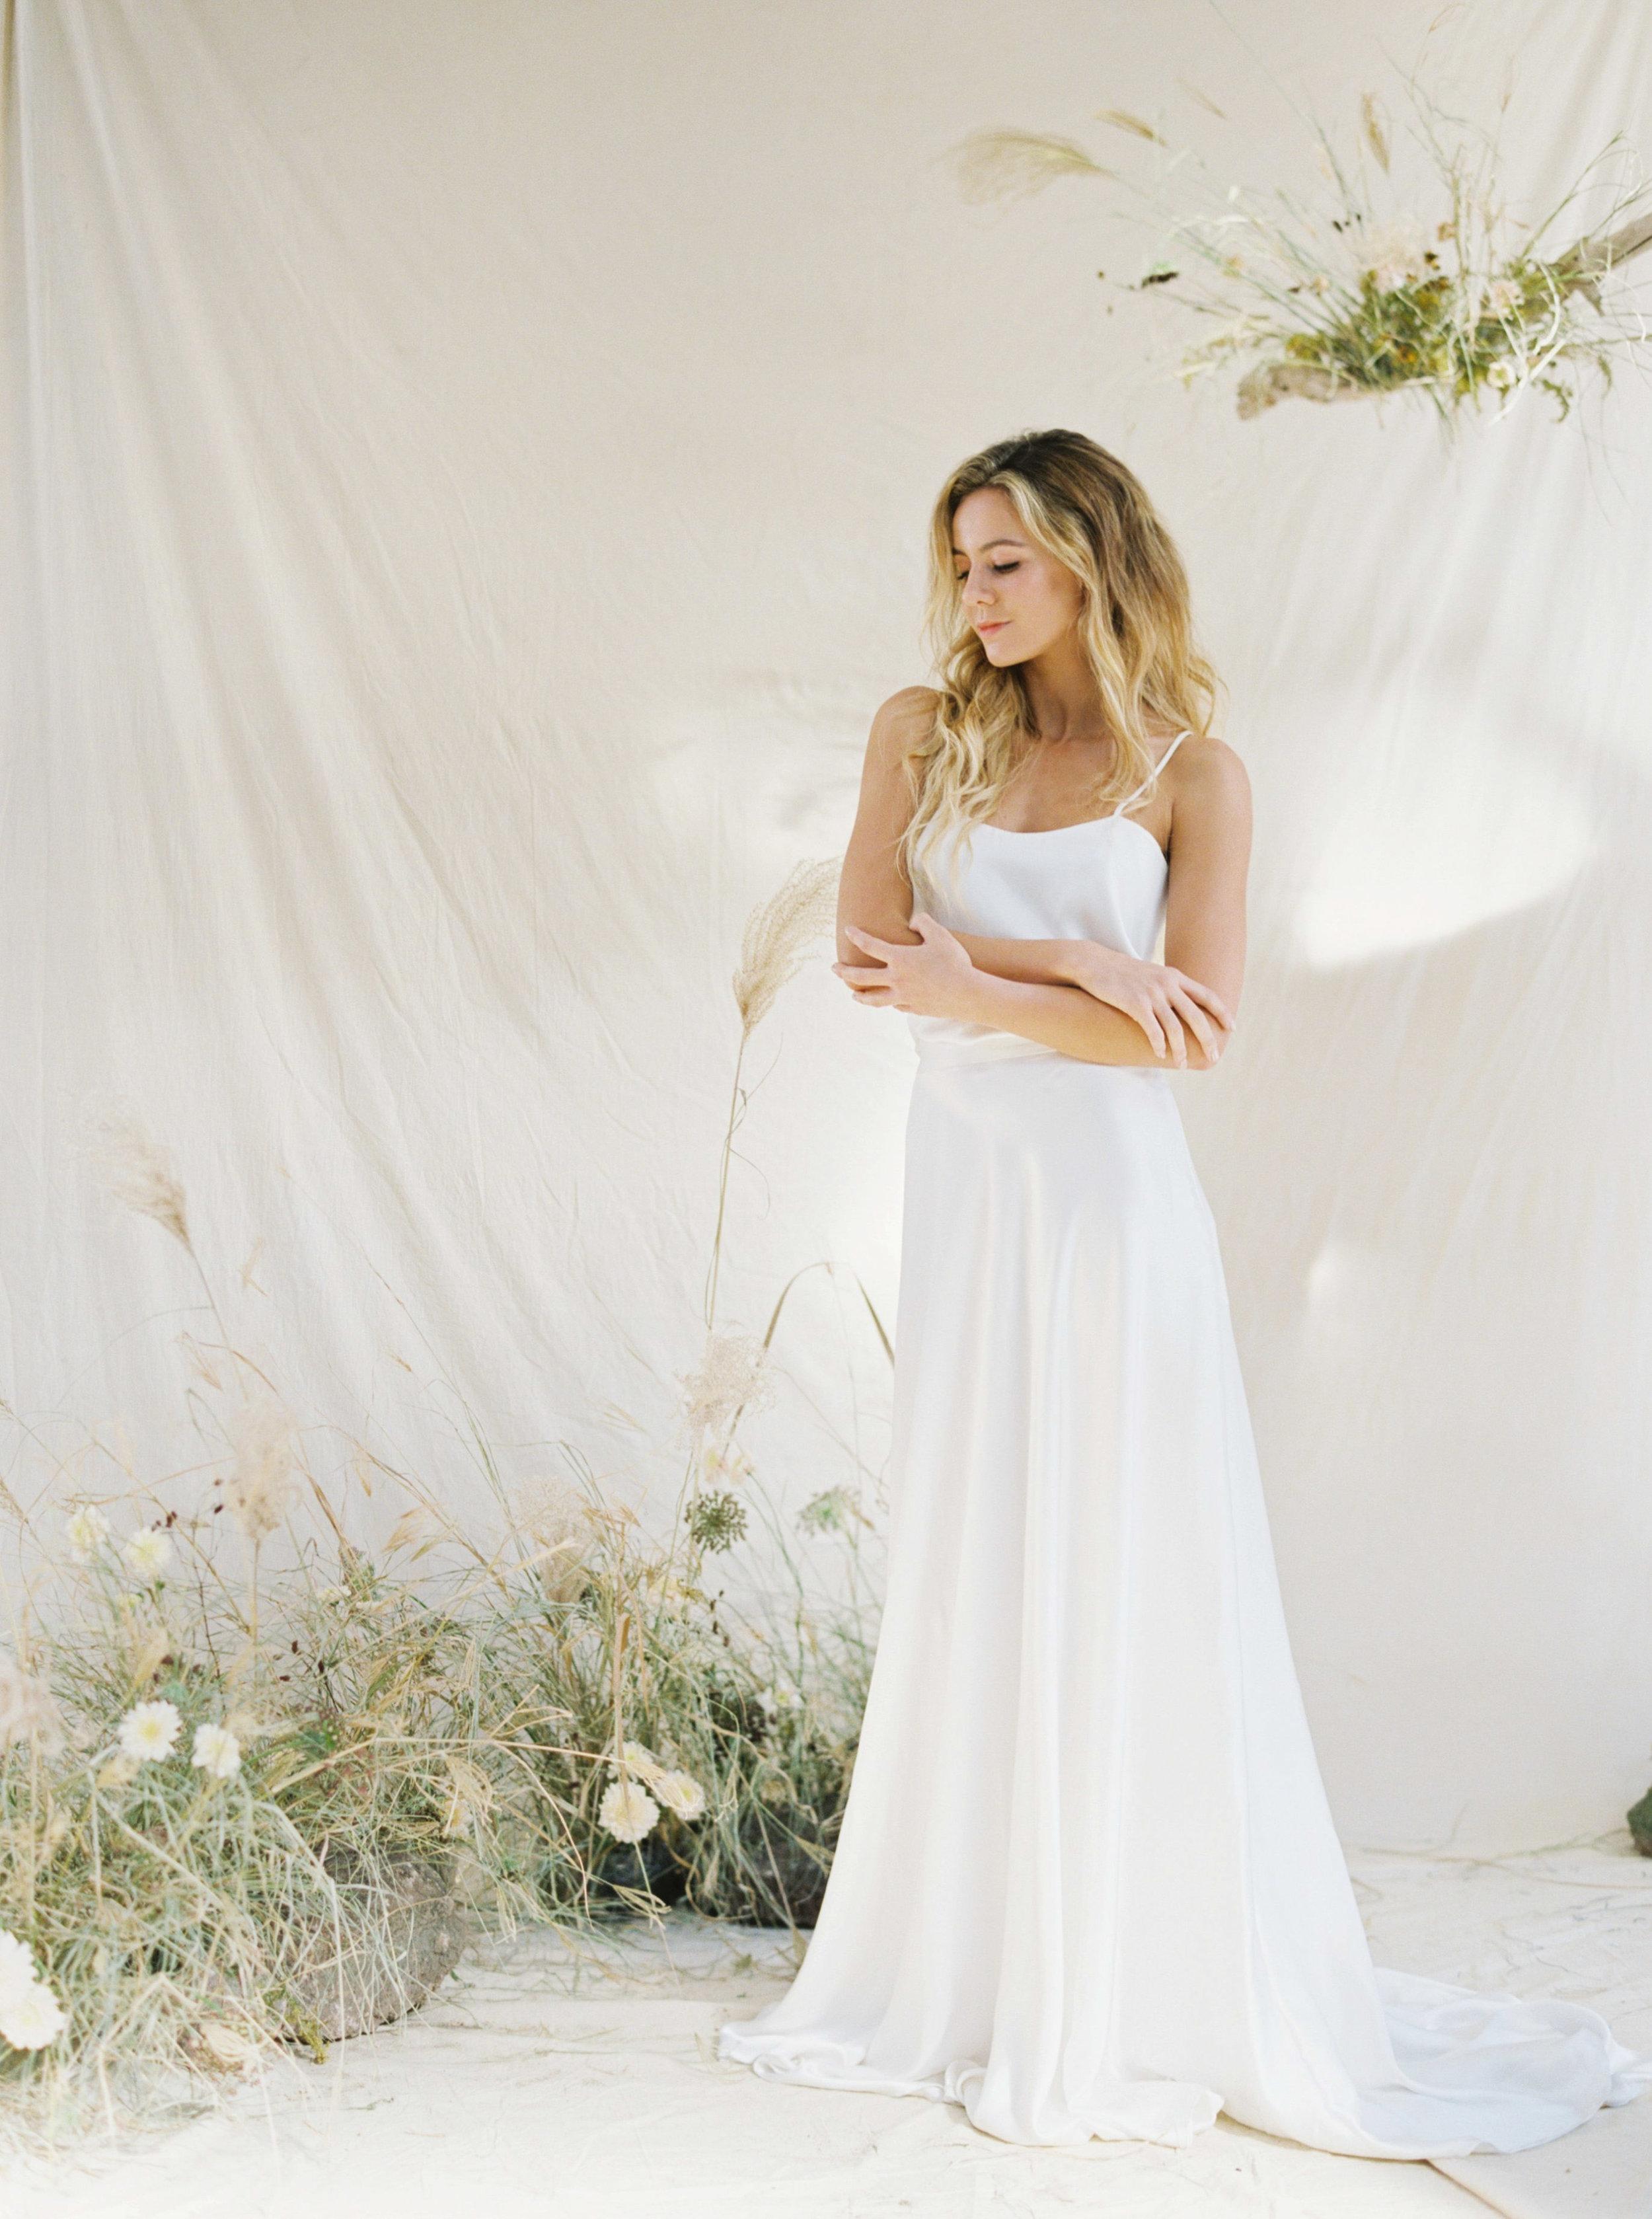 Copy of Sheri McMahon Fine Art Film NSW Sydney Bowral Wedding Photographer - Bride wedding gown